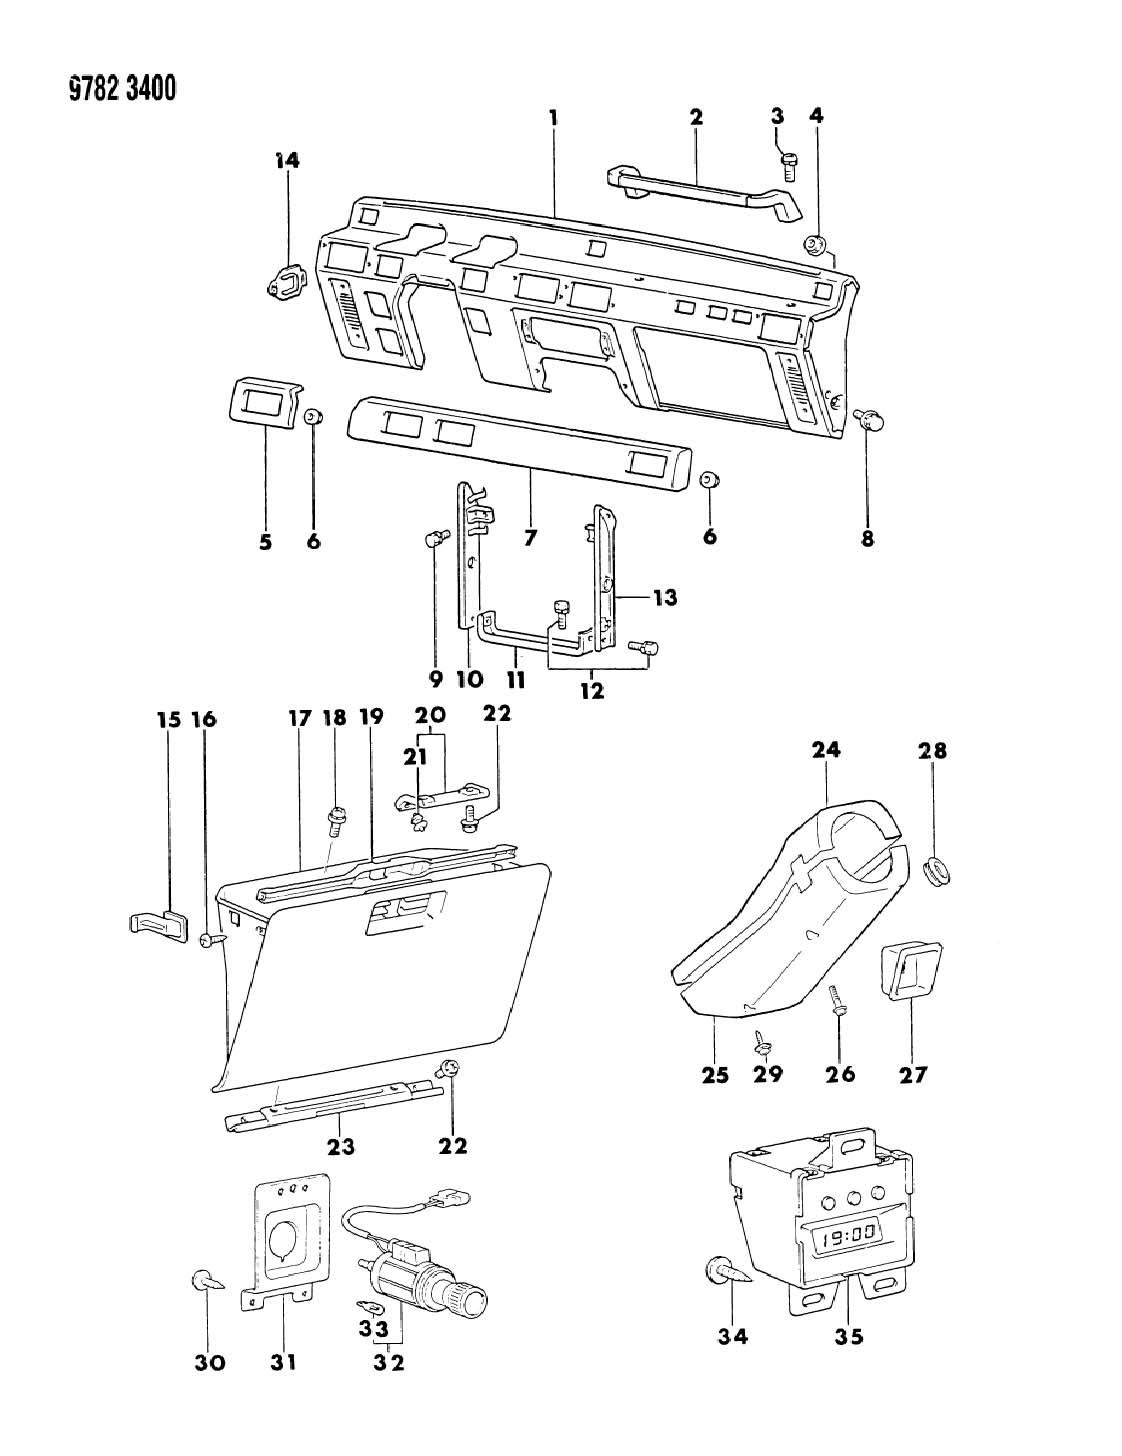 Chrysler Sebring Bumper. Glove box door. Bumper, glovebox